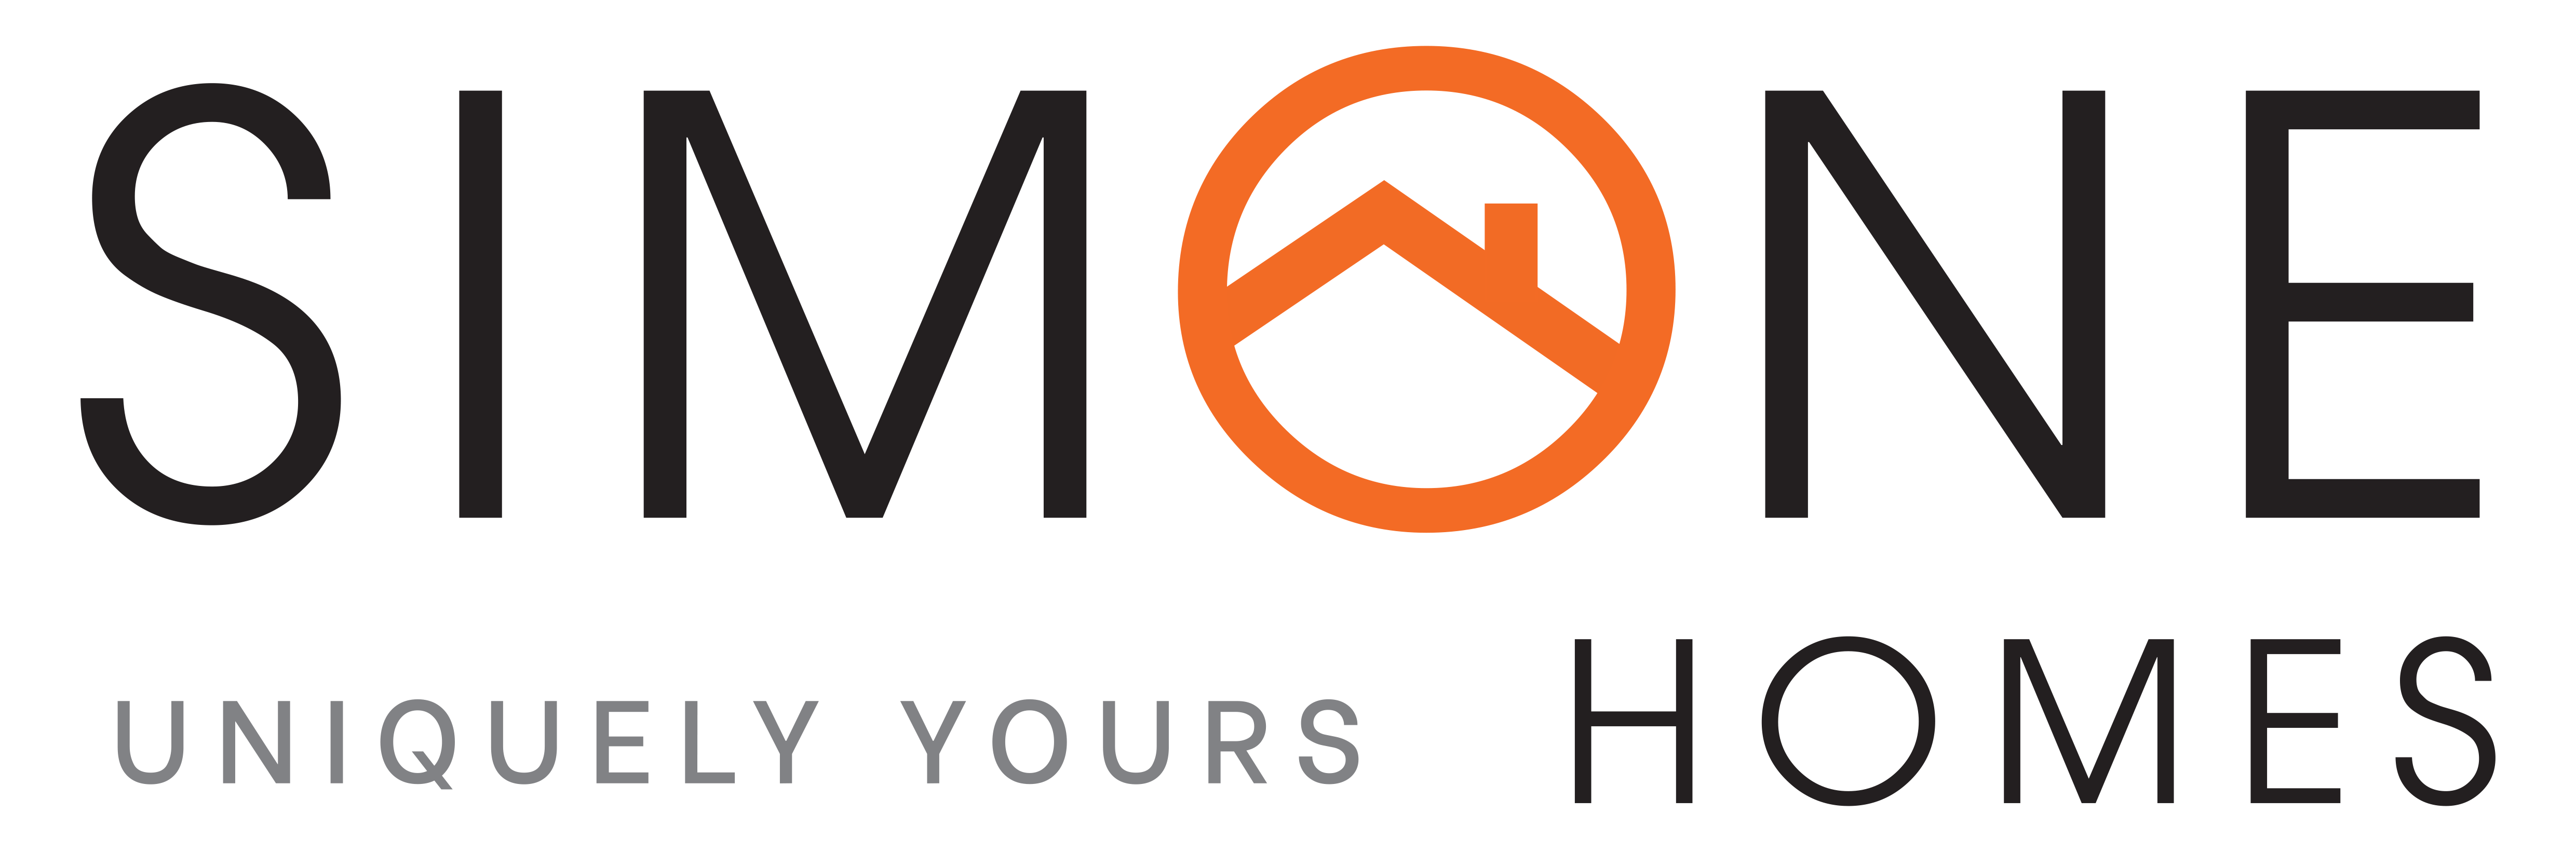 Simone Homes